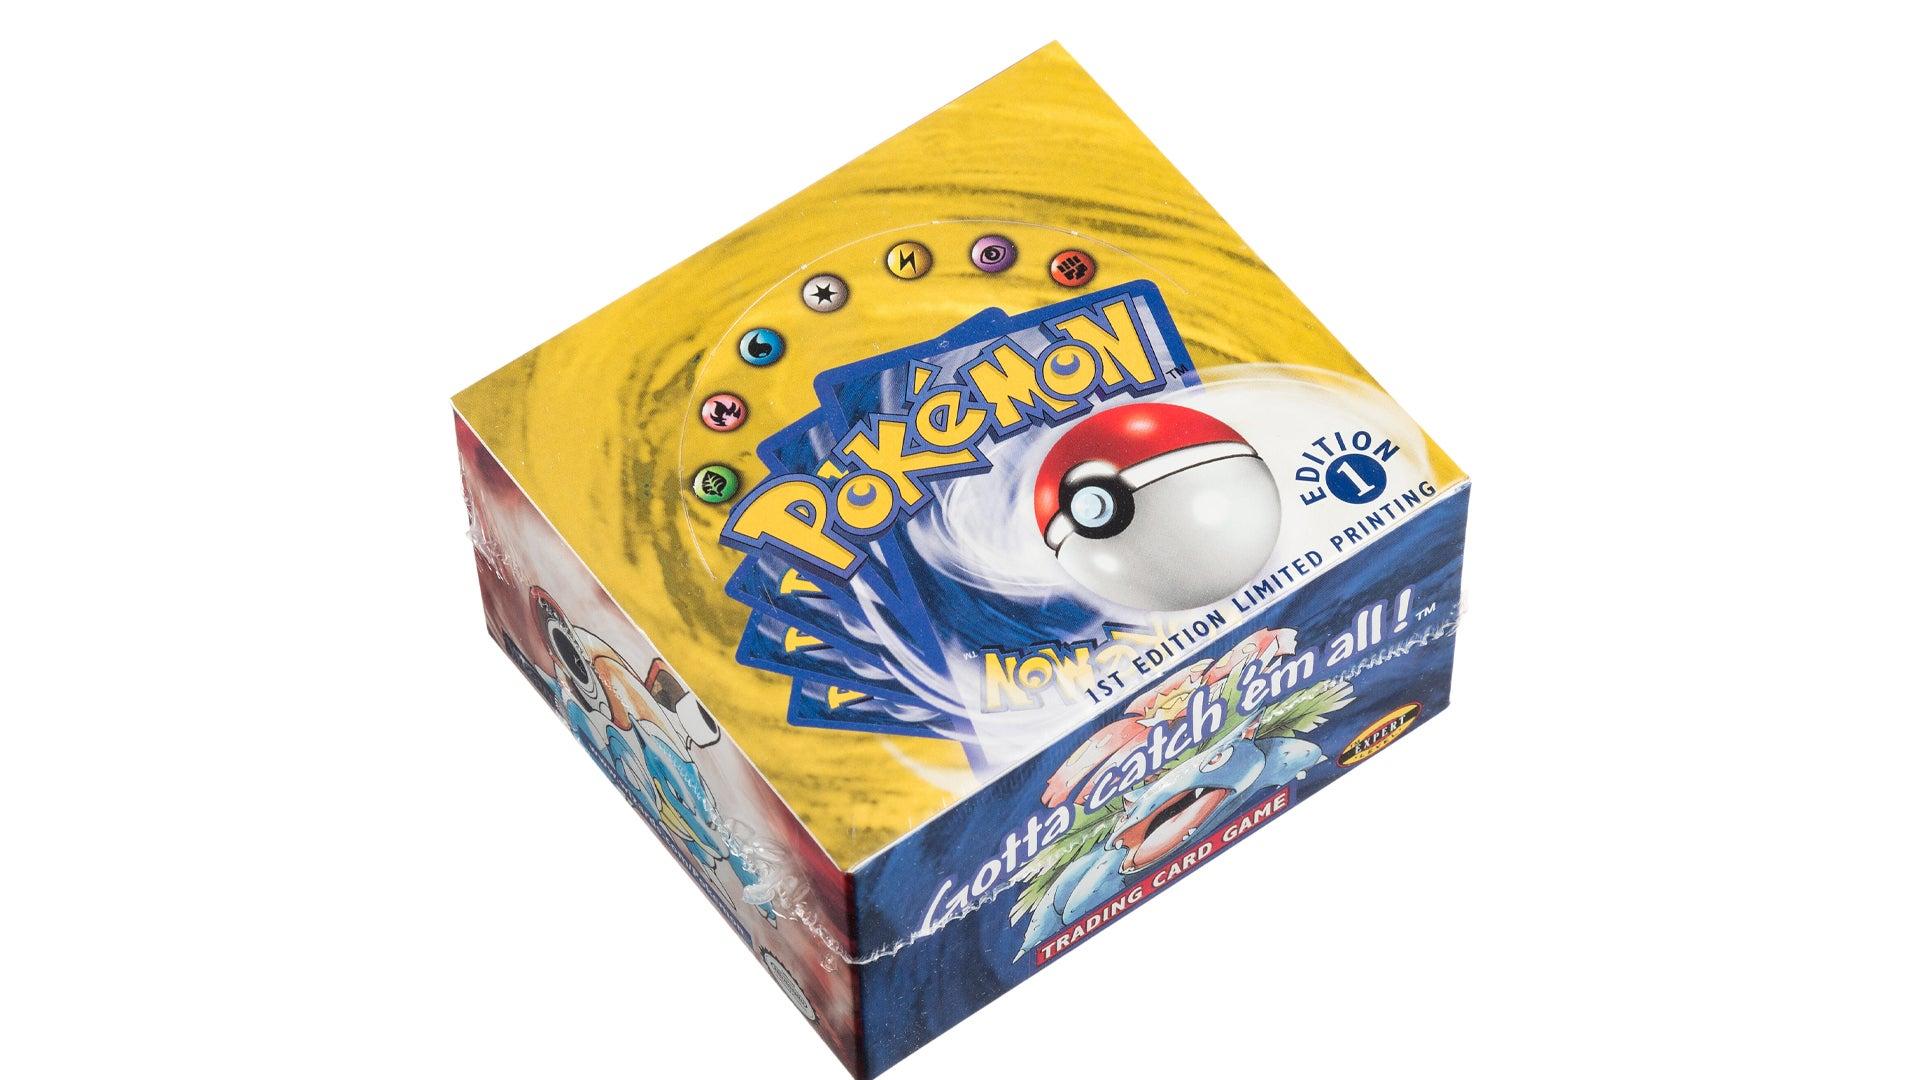 Pokémon trading card booster box